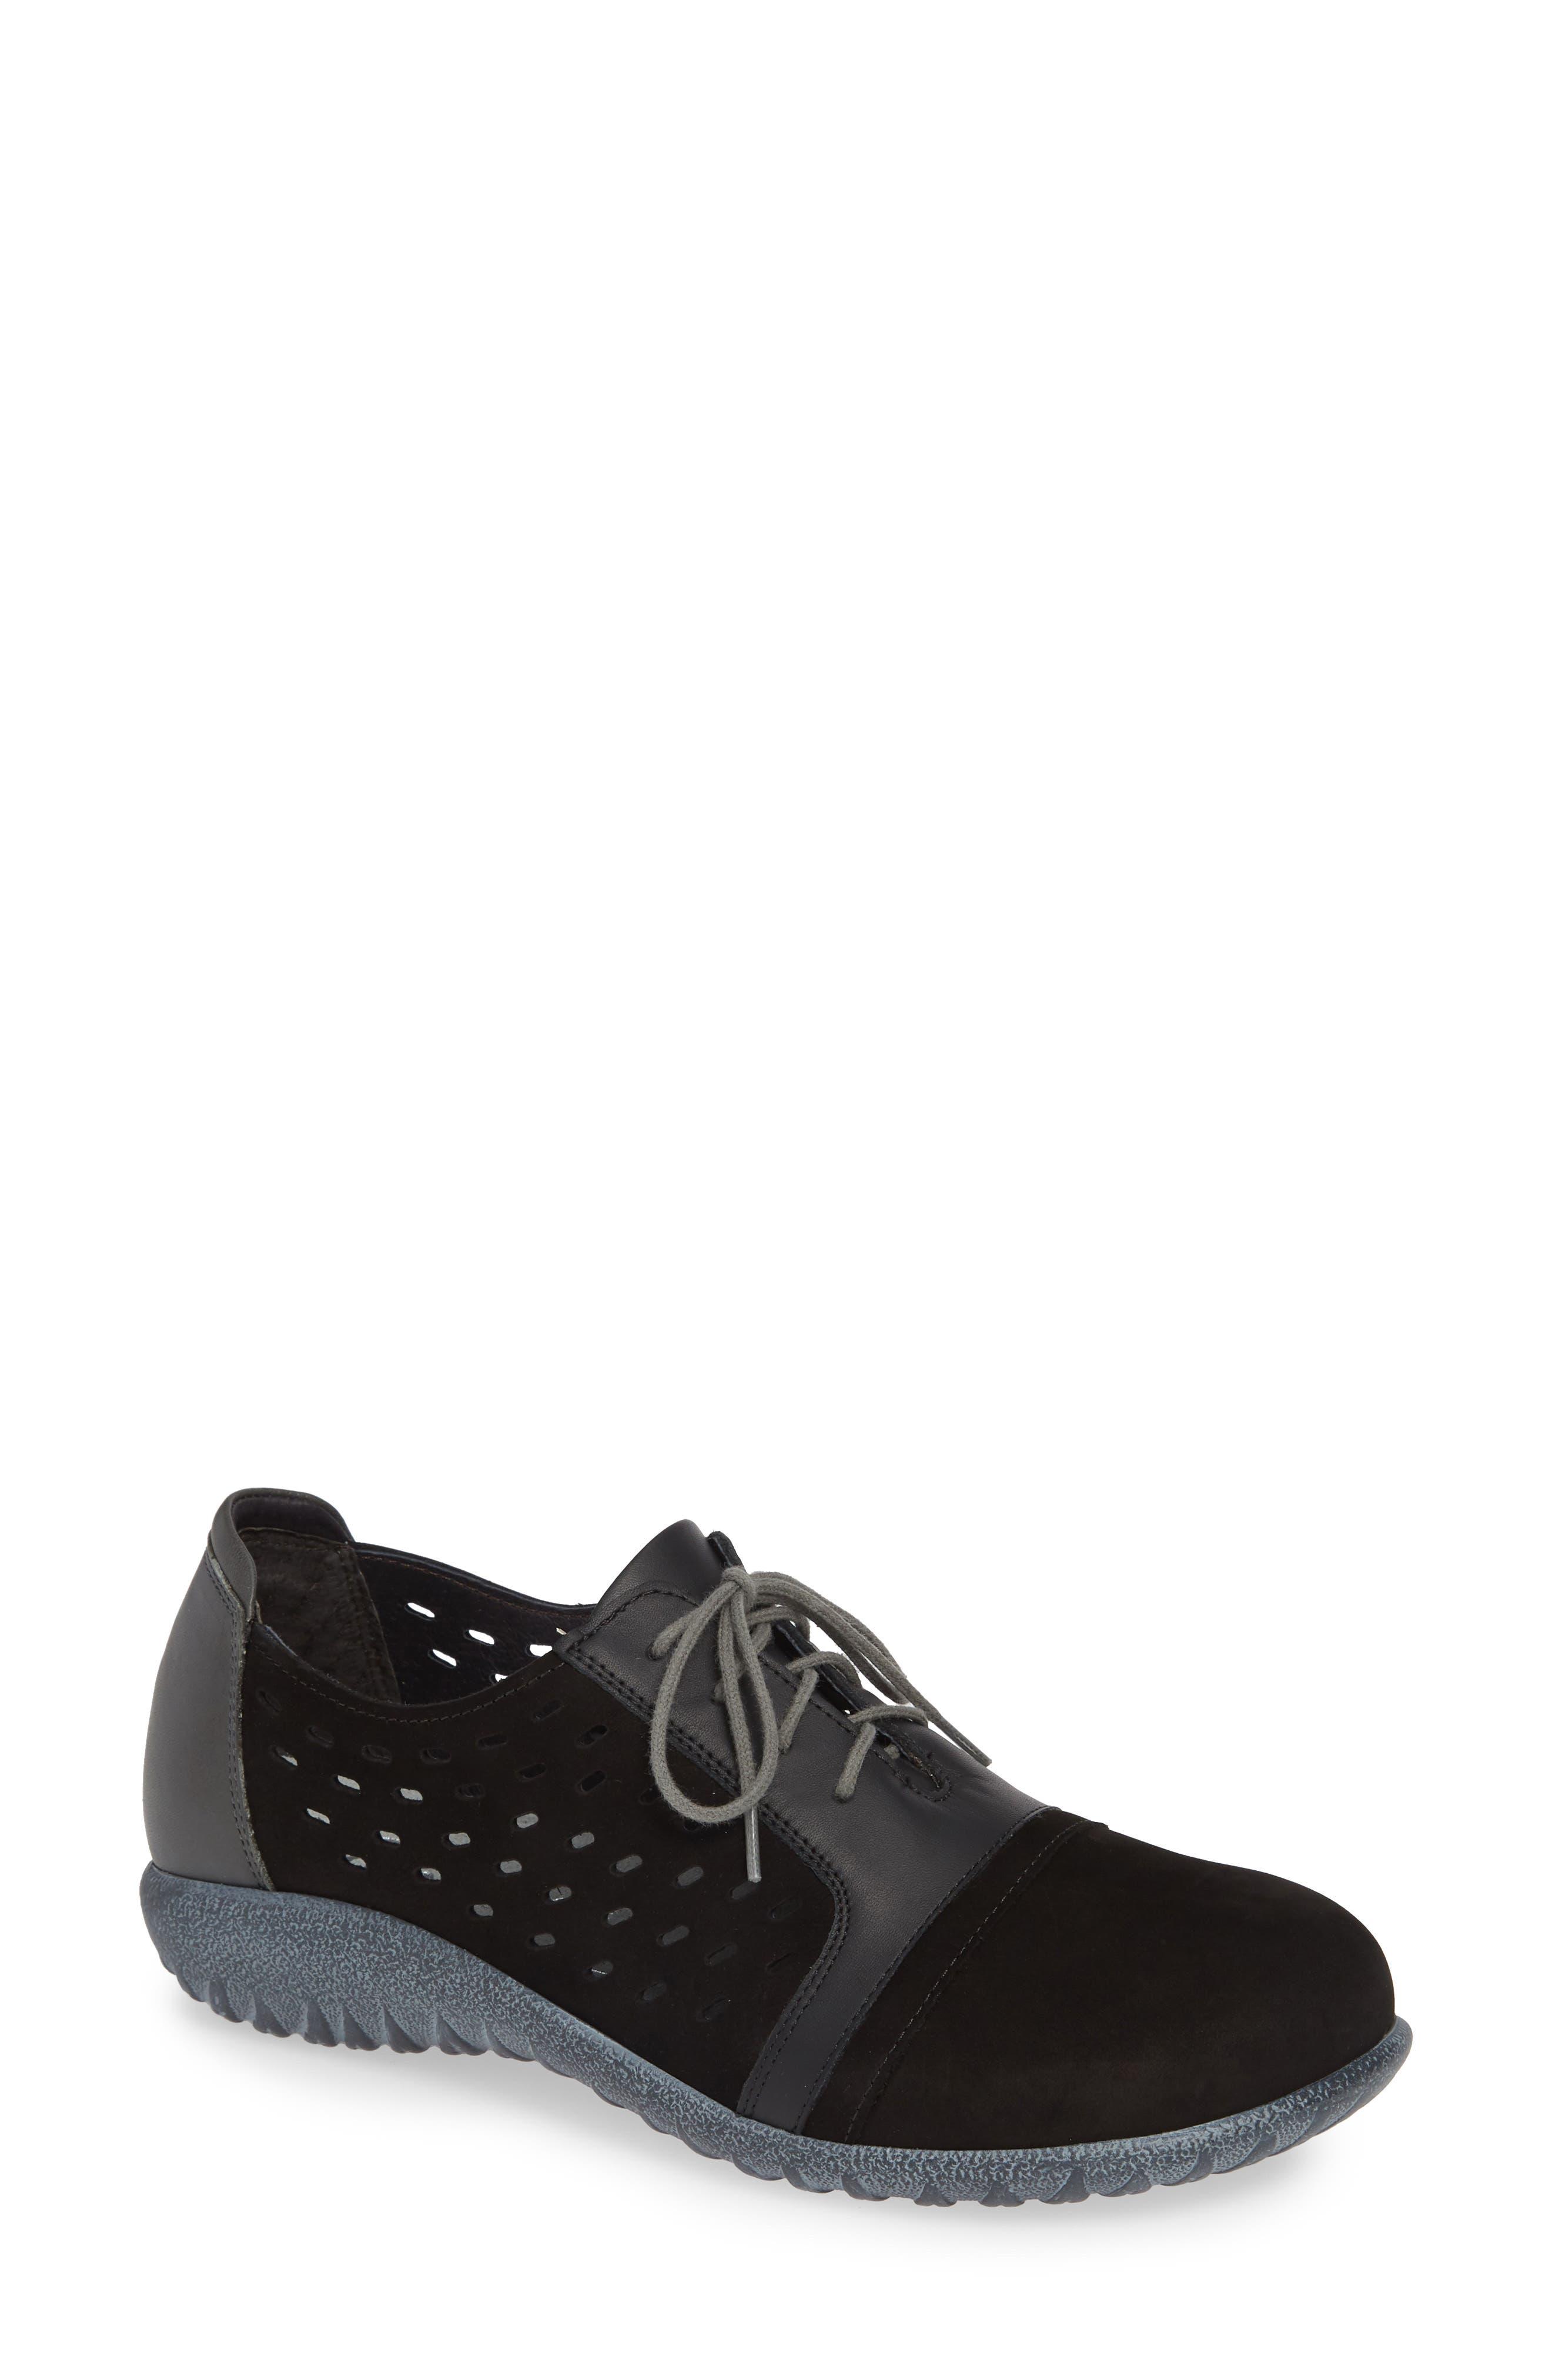 NAOT Lalo Sneaker, Main, color, BLACK NUBUCK